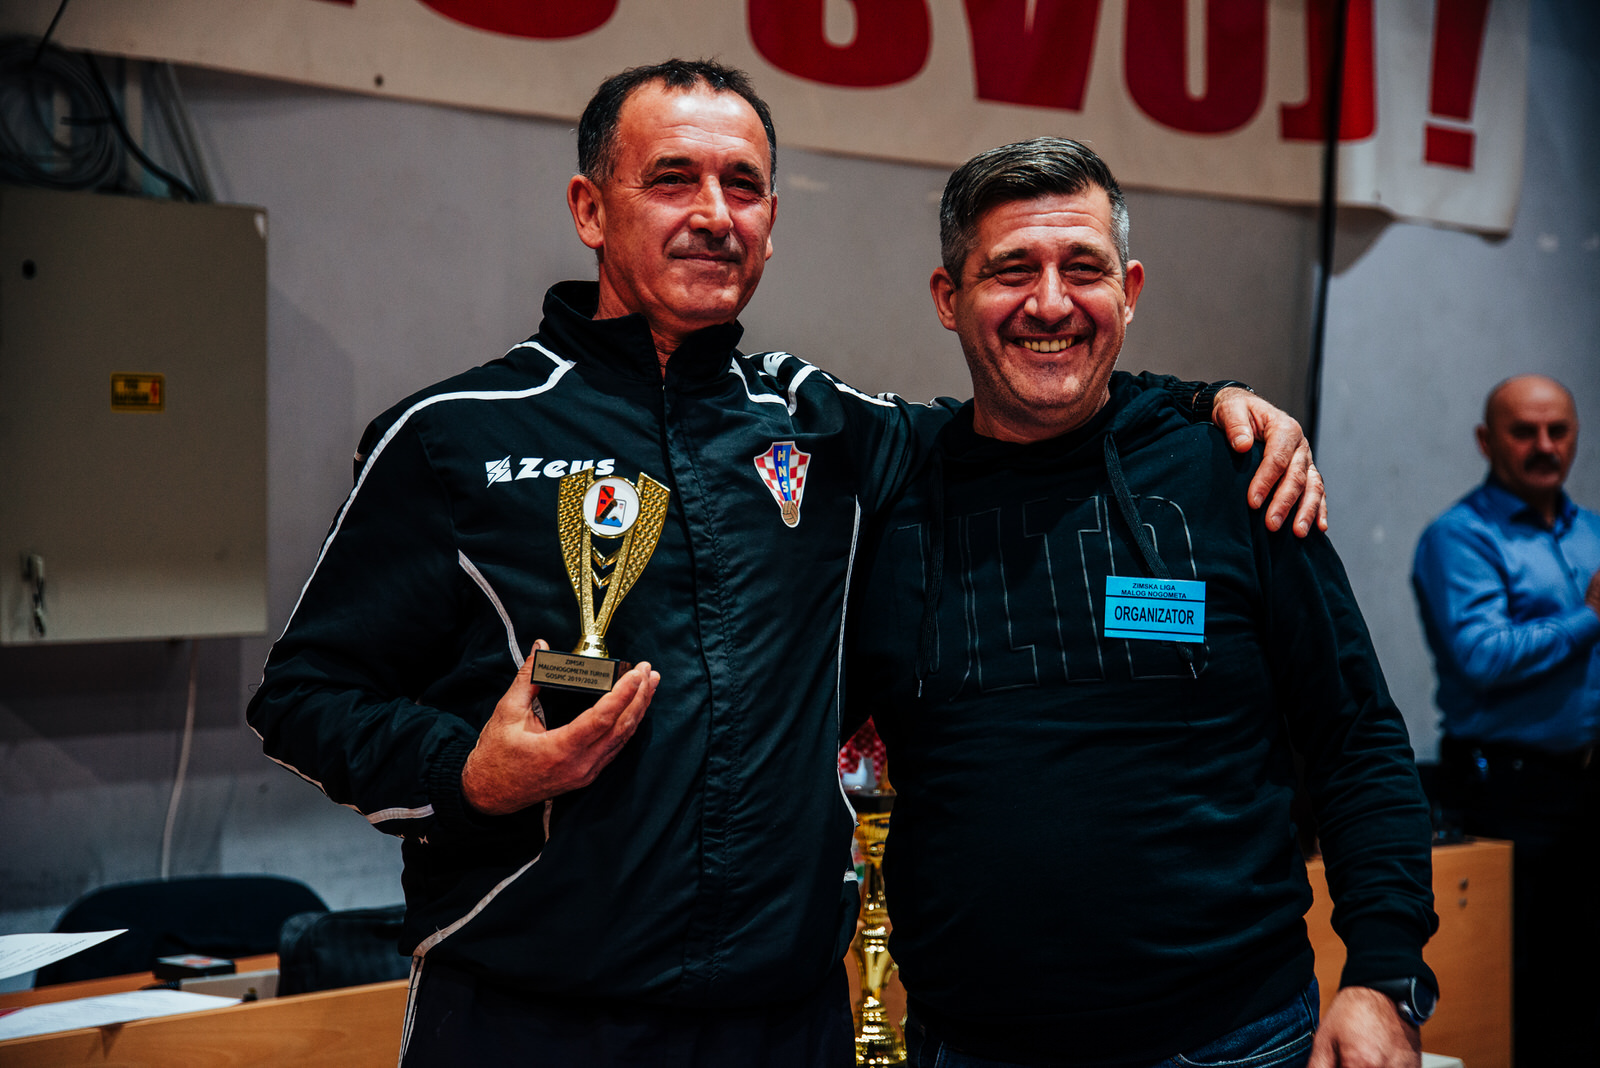 likaclub_zimska-malonogometna-liga-gospić_2019-20-133